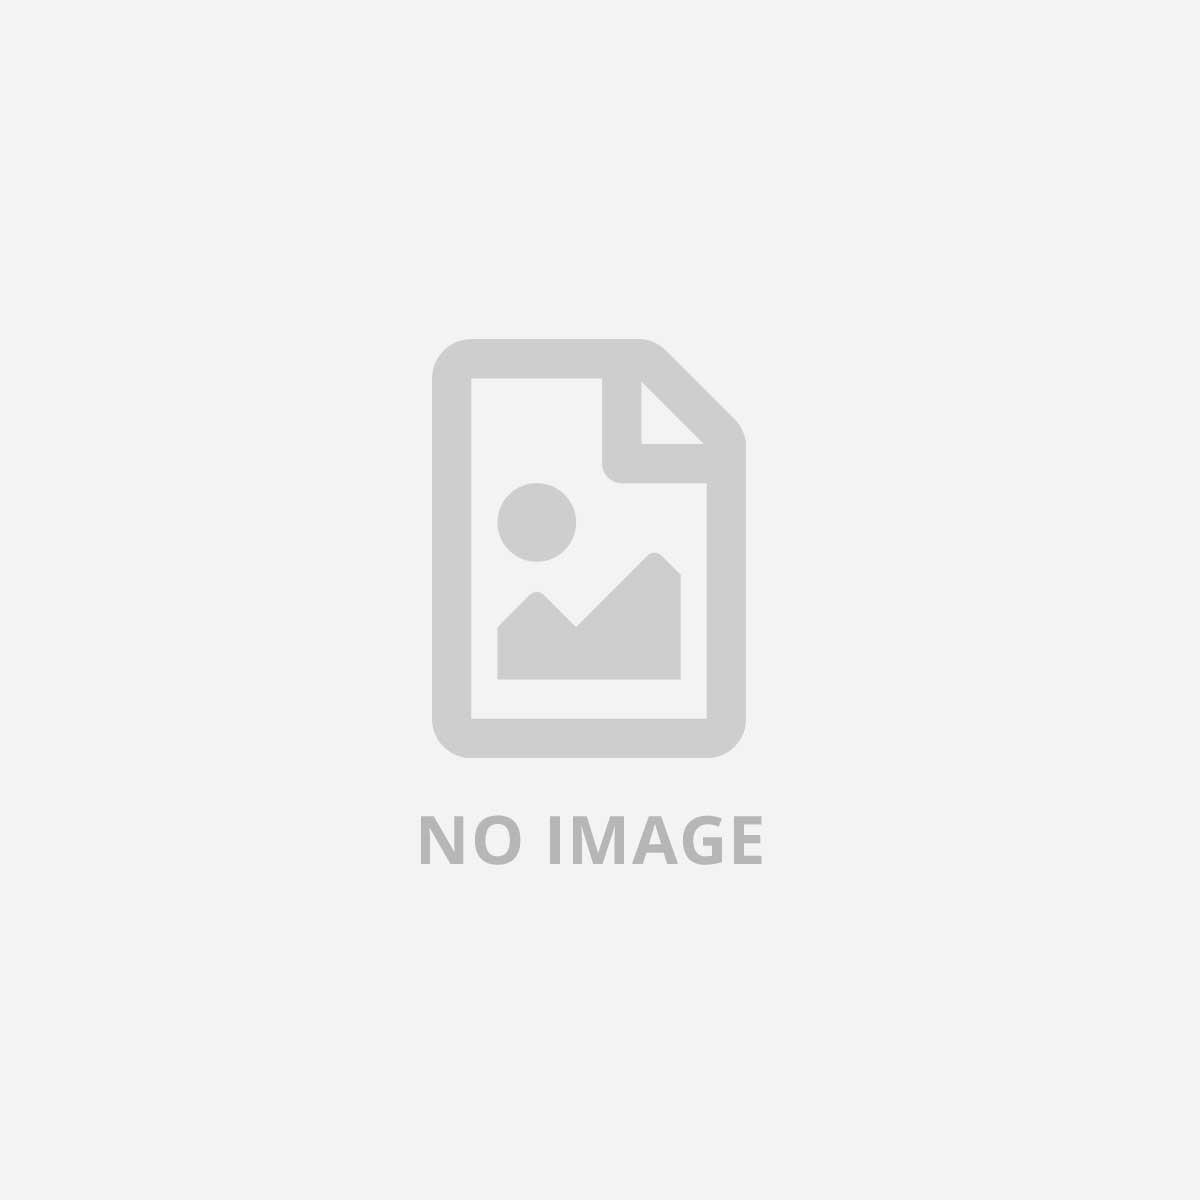 APC PROT. LINEA DATI RS232 9 DA F. A M.